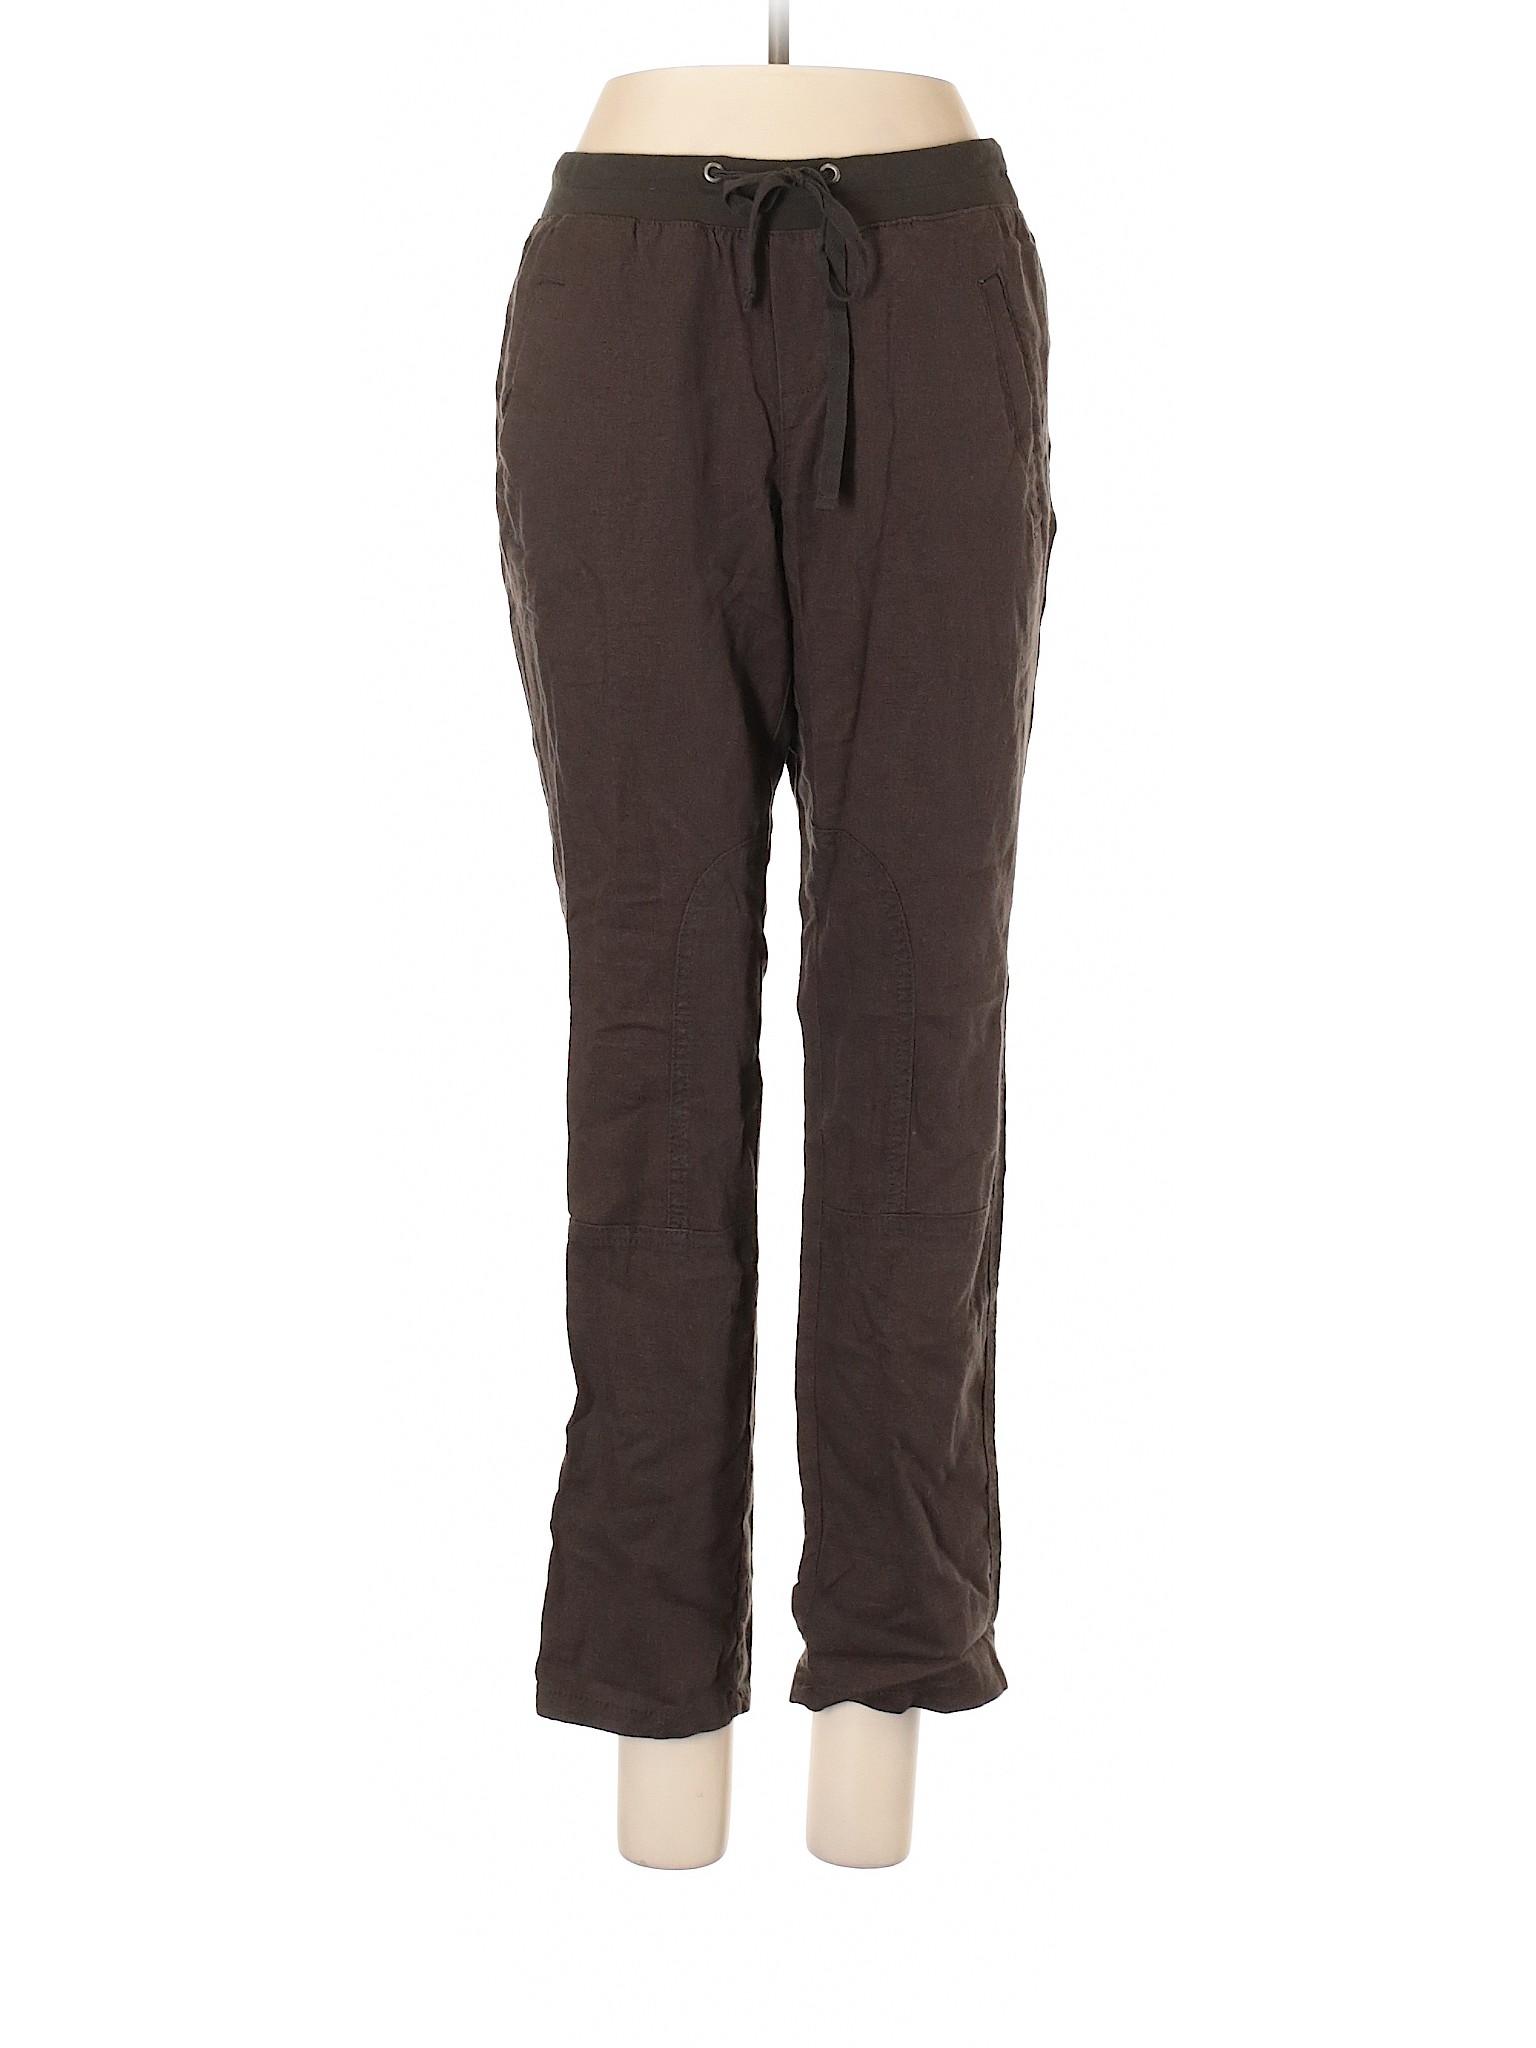 Outlet Pants Linen Gap winter Leisure 7qXAIEh